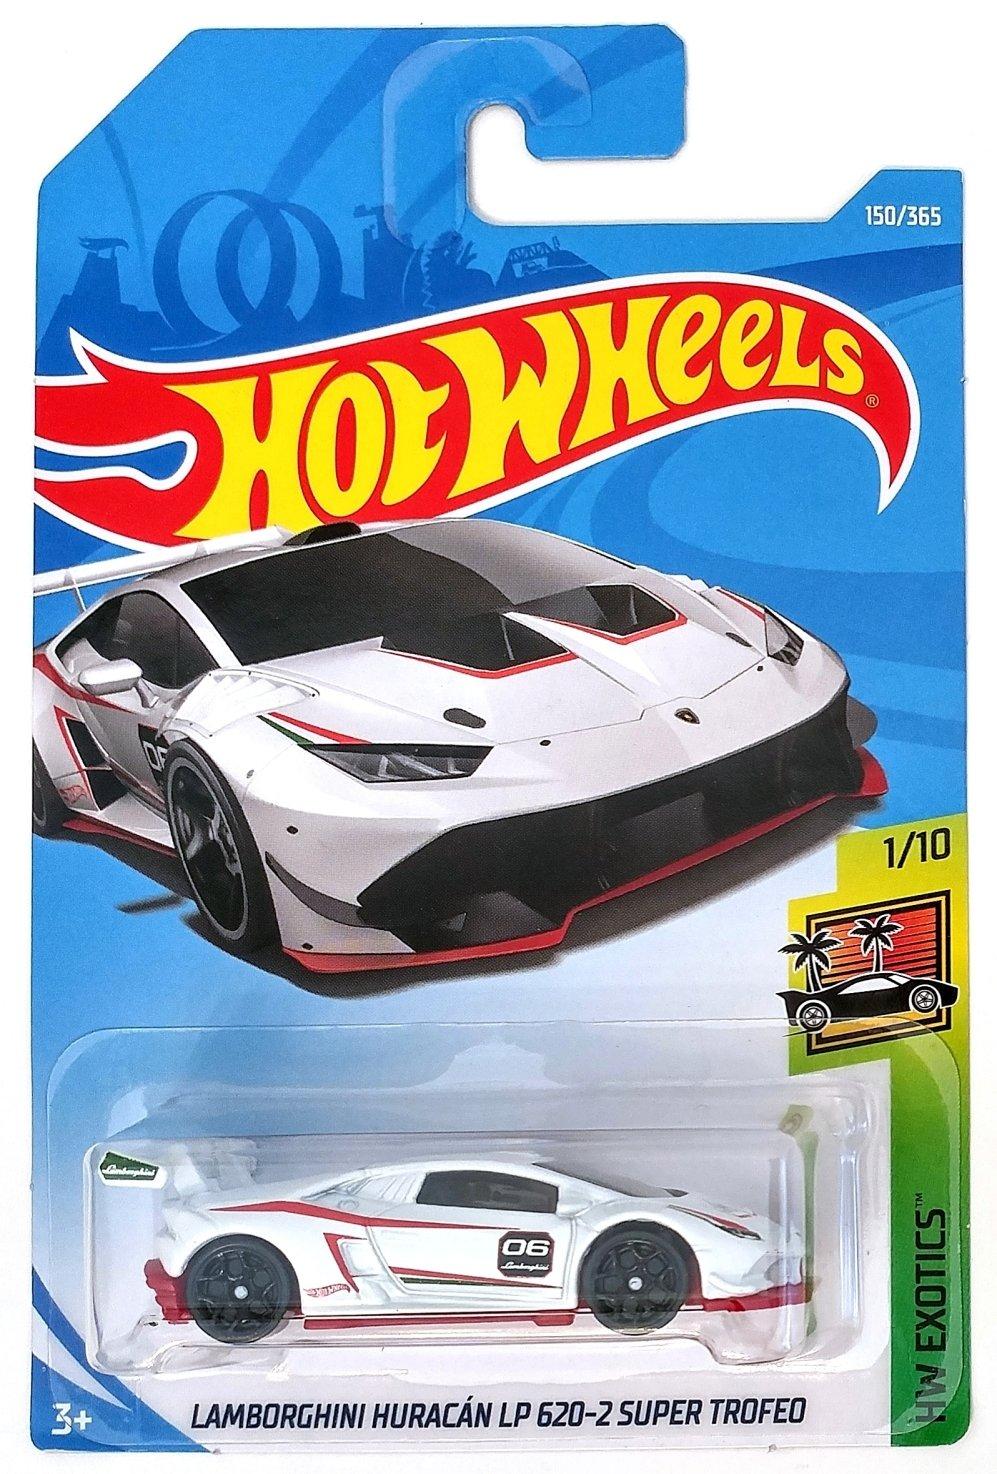 Hot Wheels 2018 Lamborghini Huracan LP 620-2 Super Trofeo HW Exotics White 150/365, Long Card by Mattel